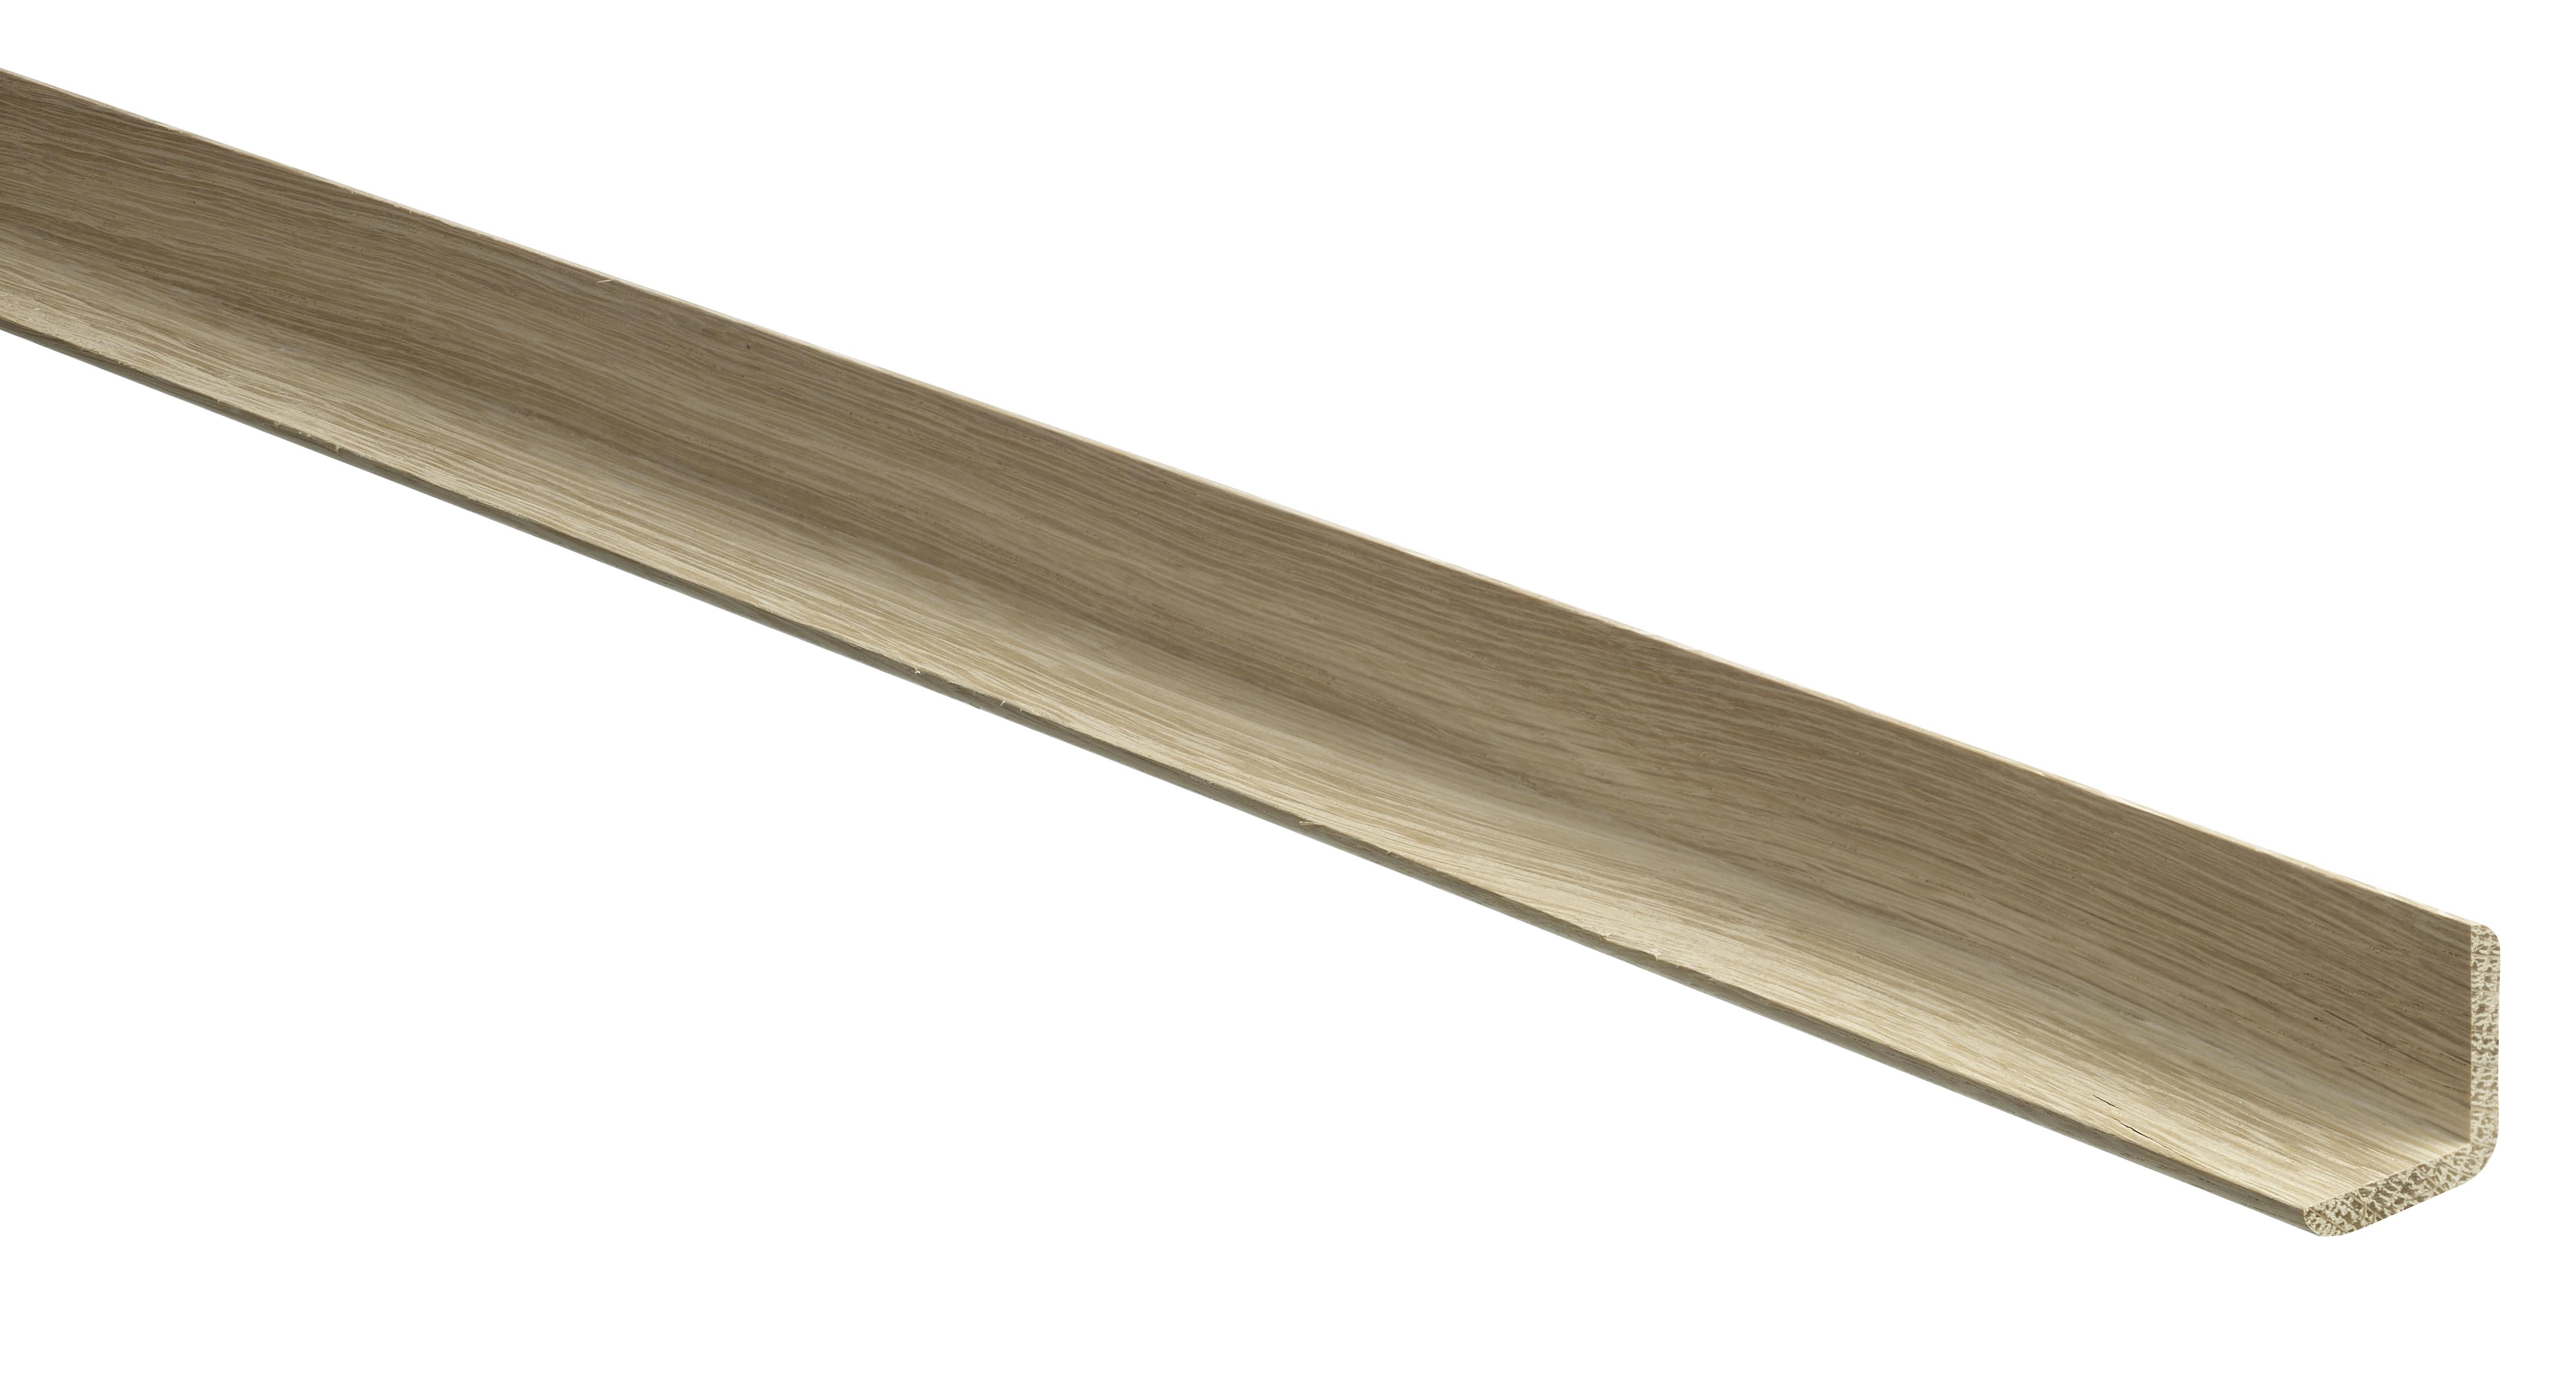 15 White Oak Basic Angle Mouldings 20 x 20 x 2400mm